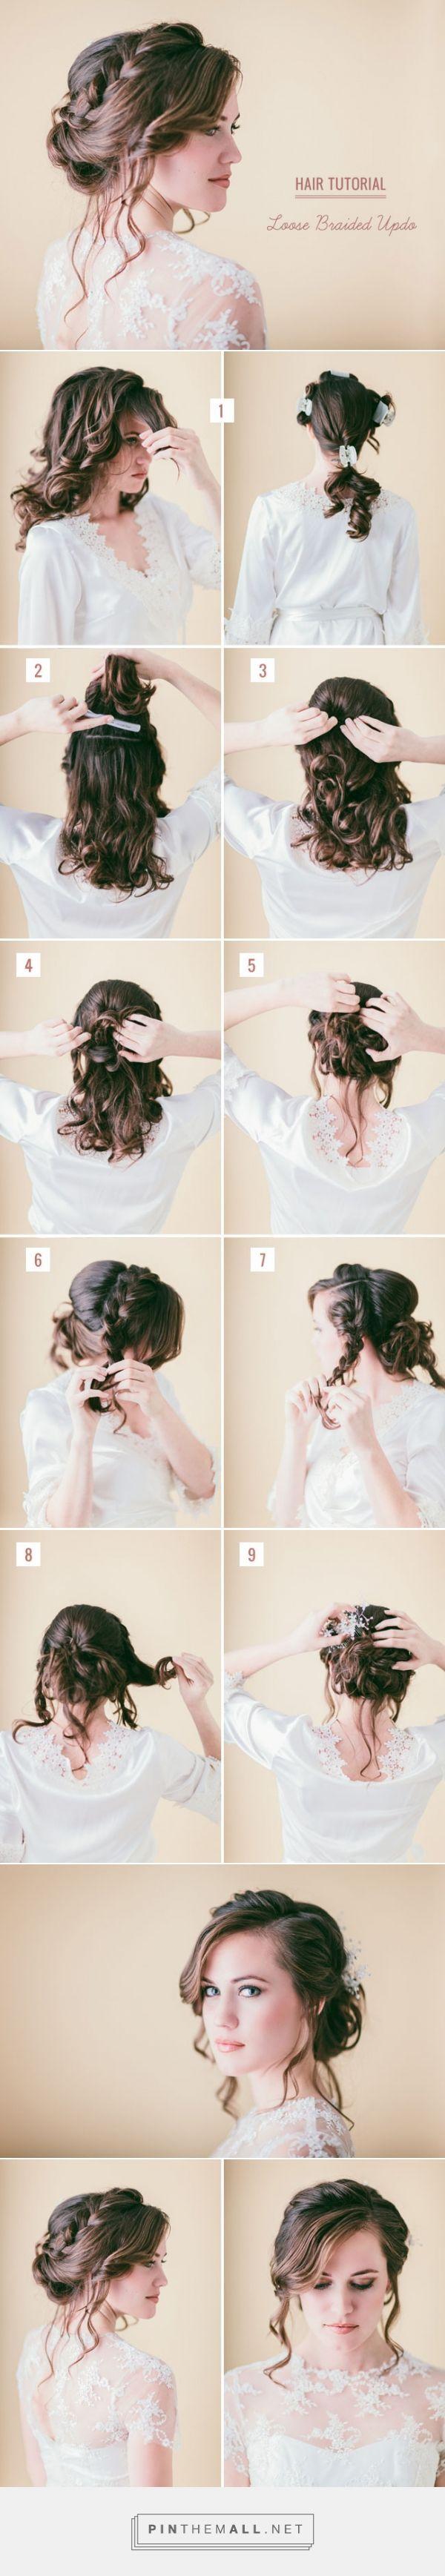 109 best | wedding hair | images on Pinterest | Bridal hairstyles ...